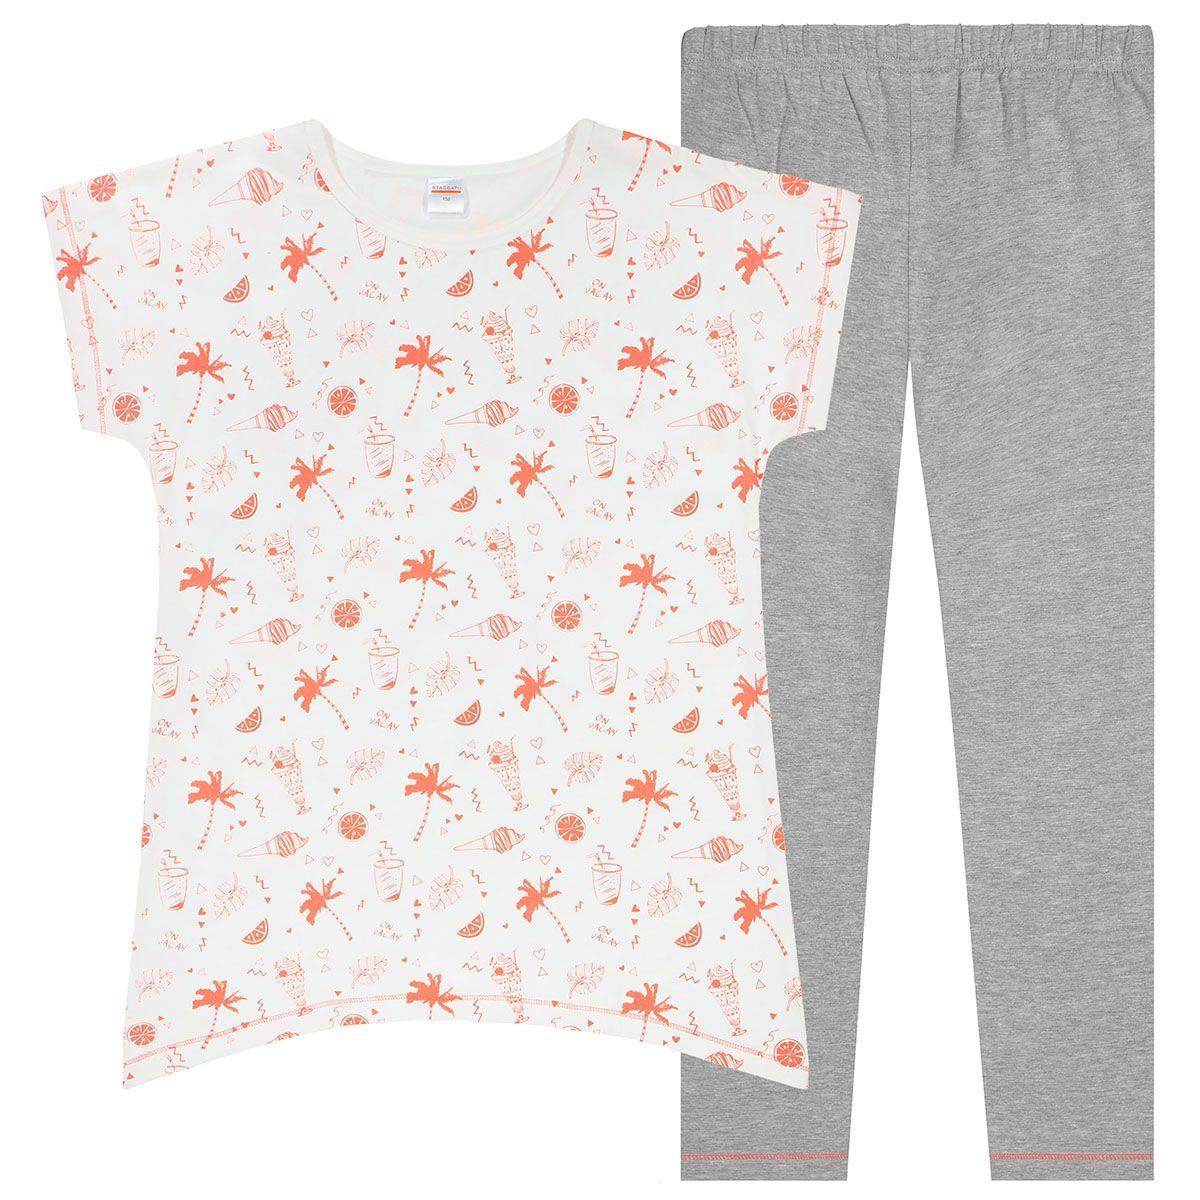 Pyjama Sommer - Offwhite Silver